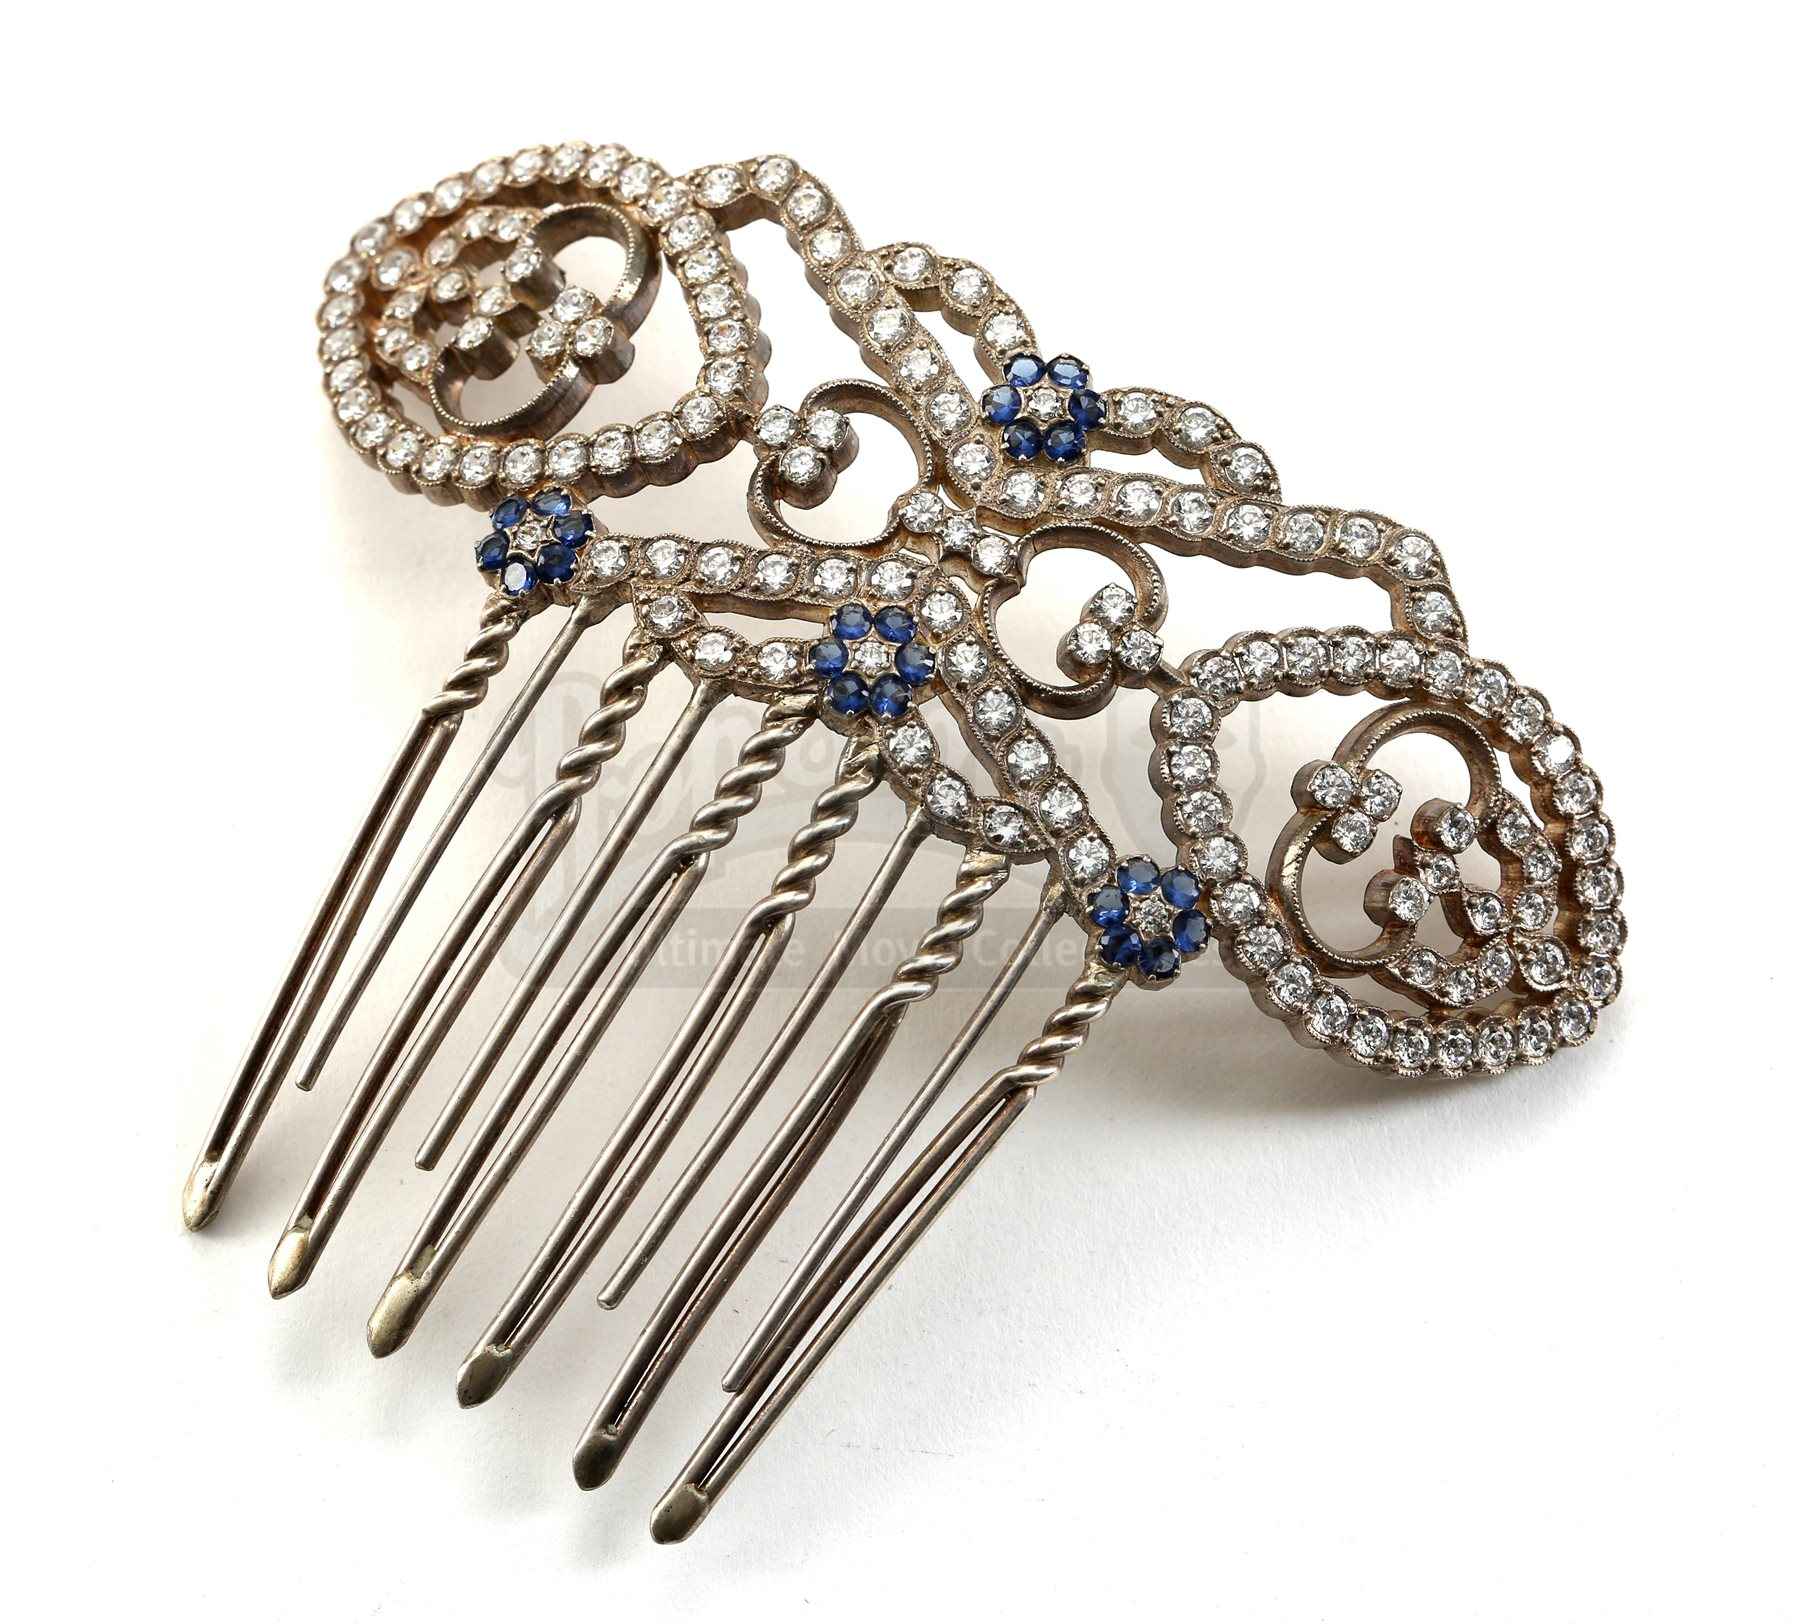 Wedding Hairstyle Price List: Bella Swan's Wedding Hair Comb